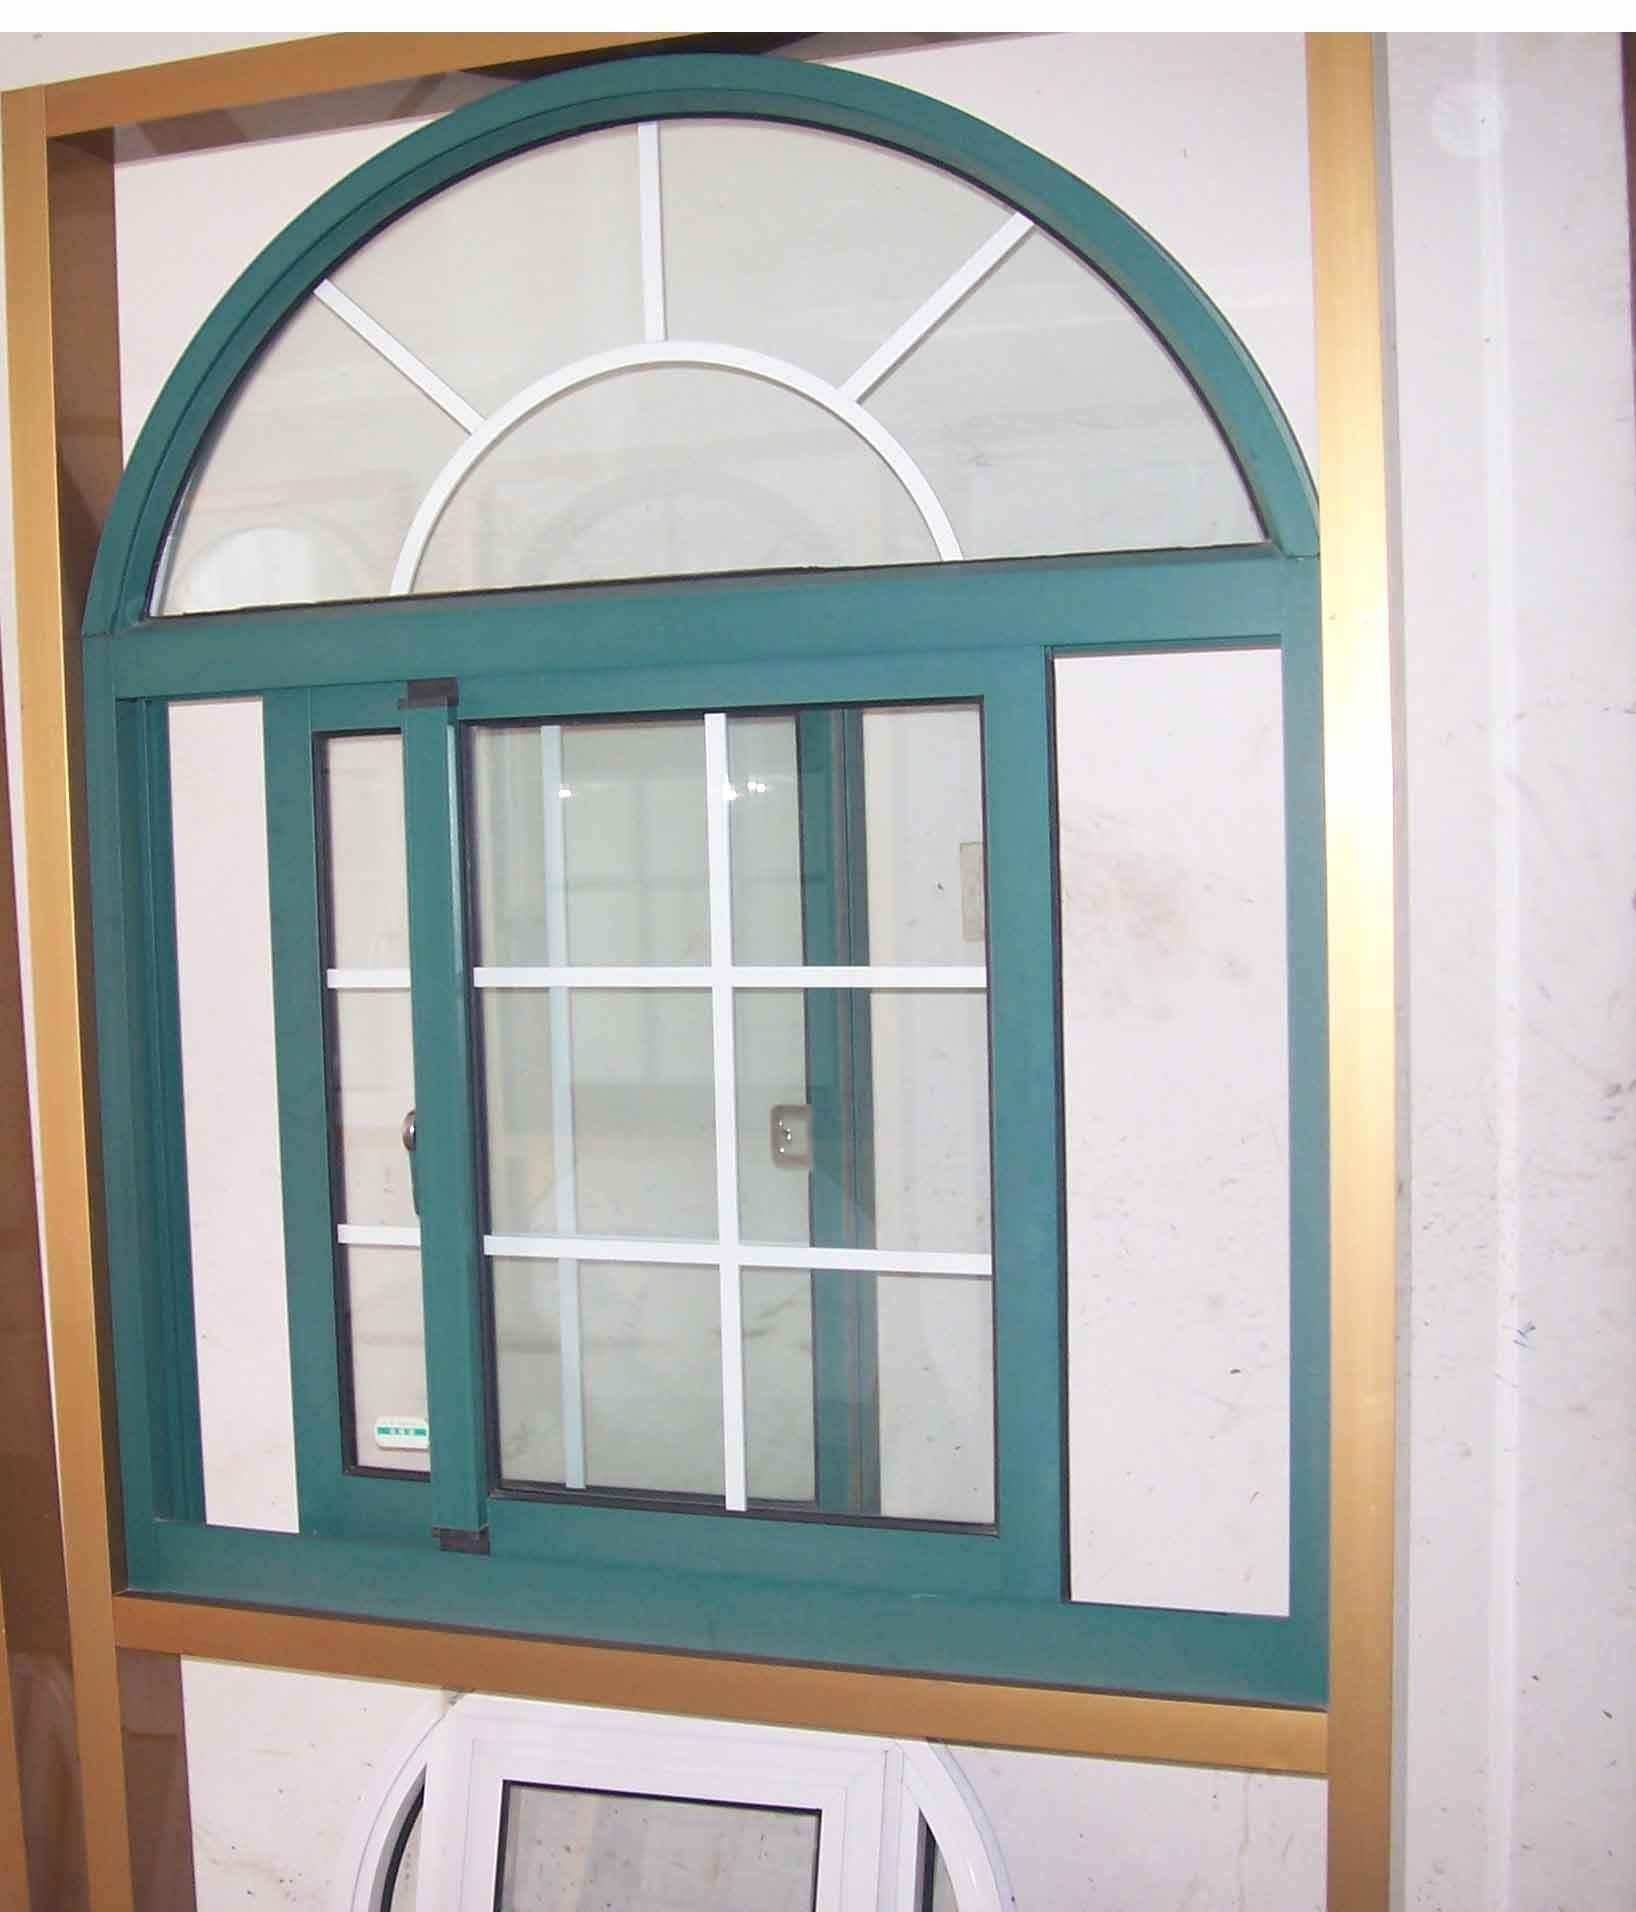 Sliding windows with energy saving feature